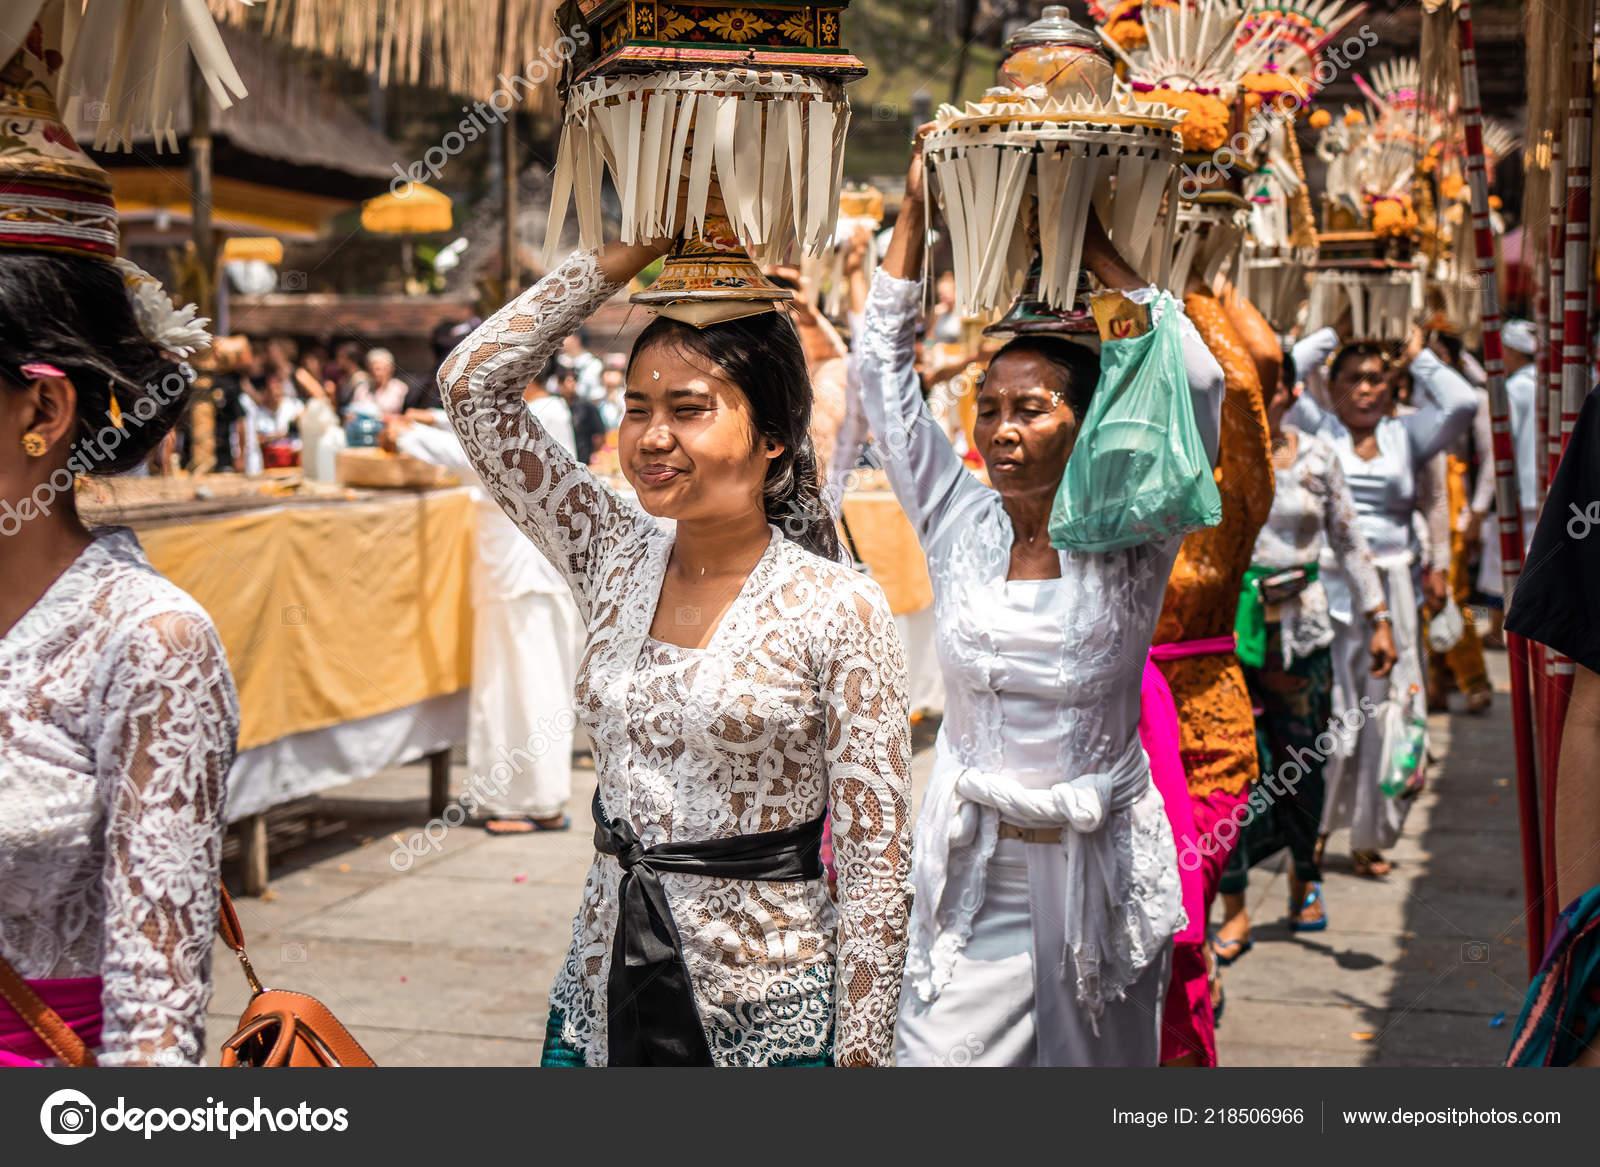 Bali Indonesia September 25 2018 Balinese Women In